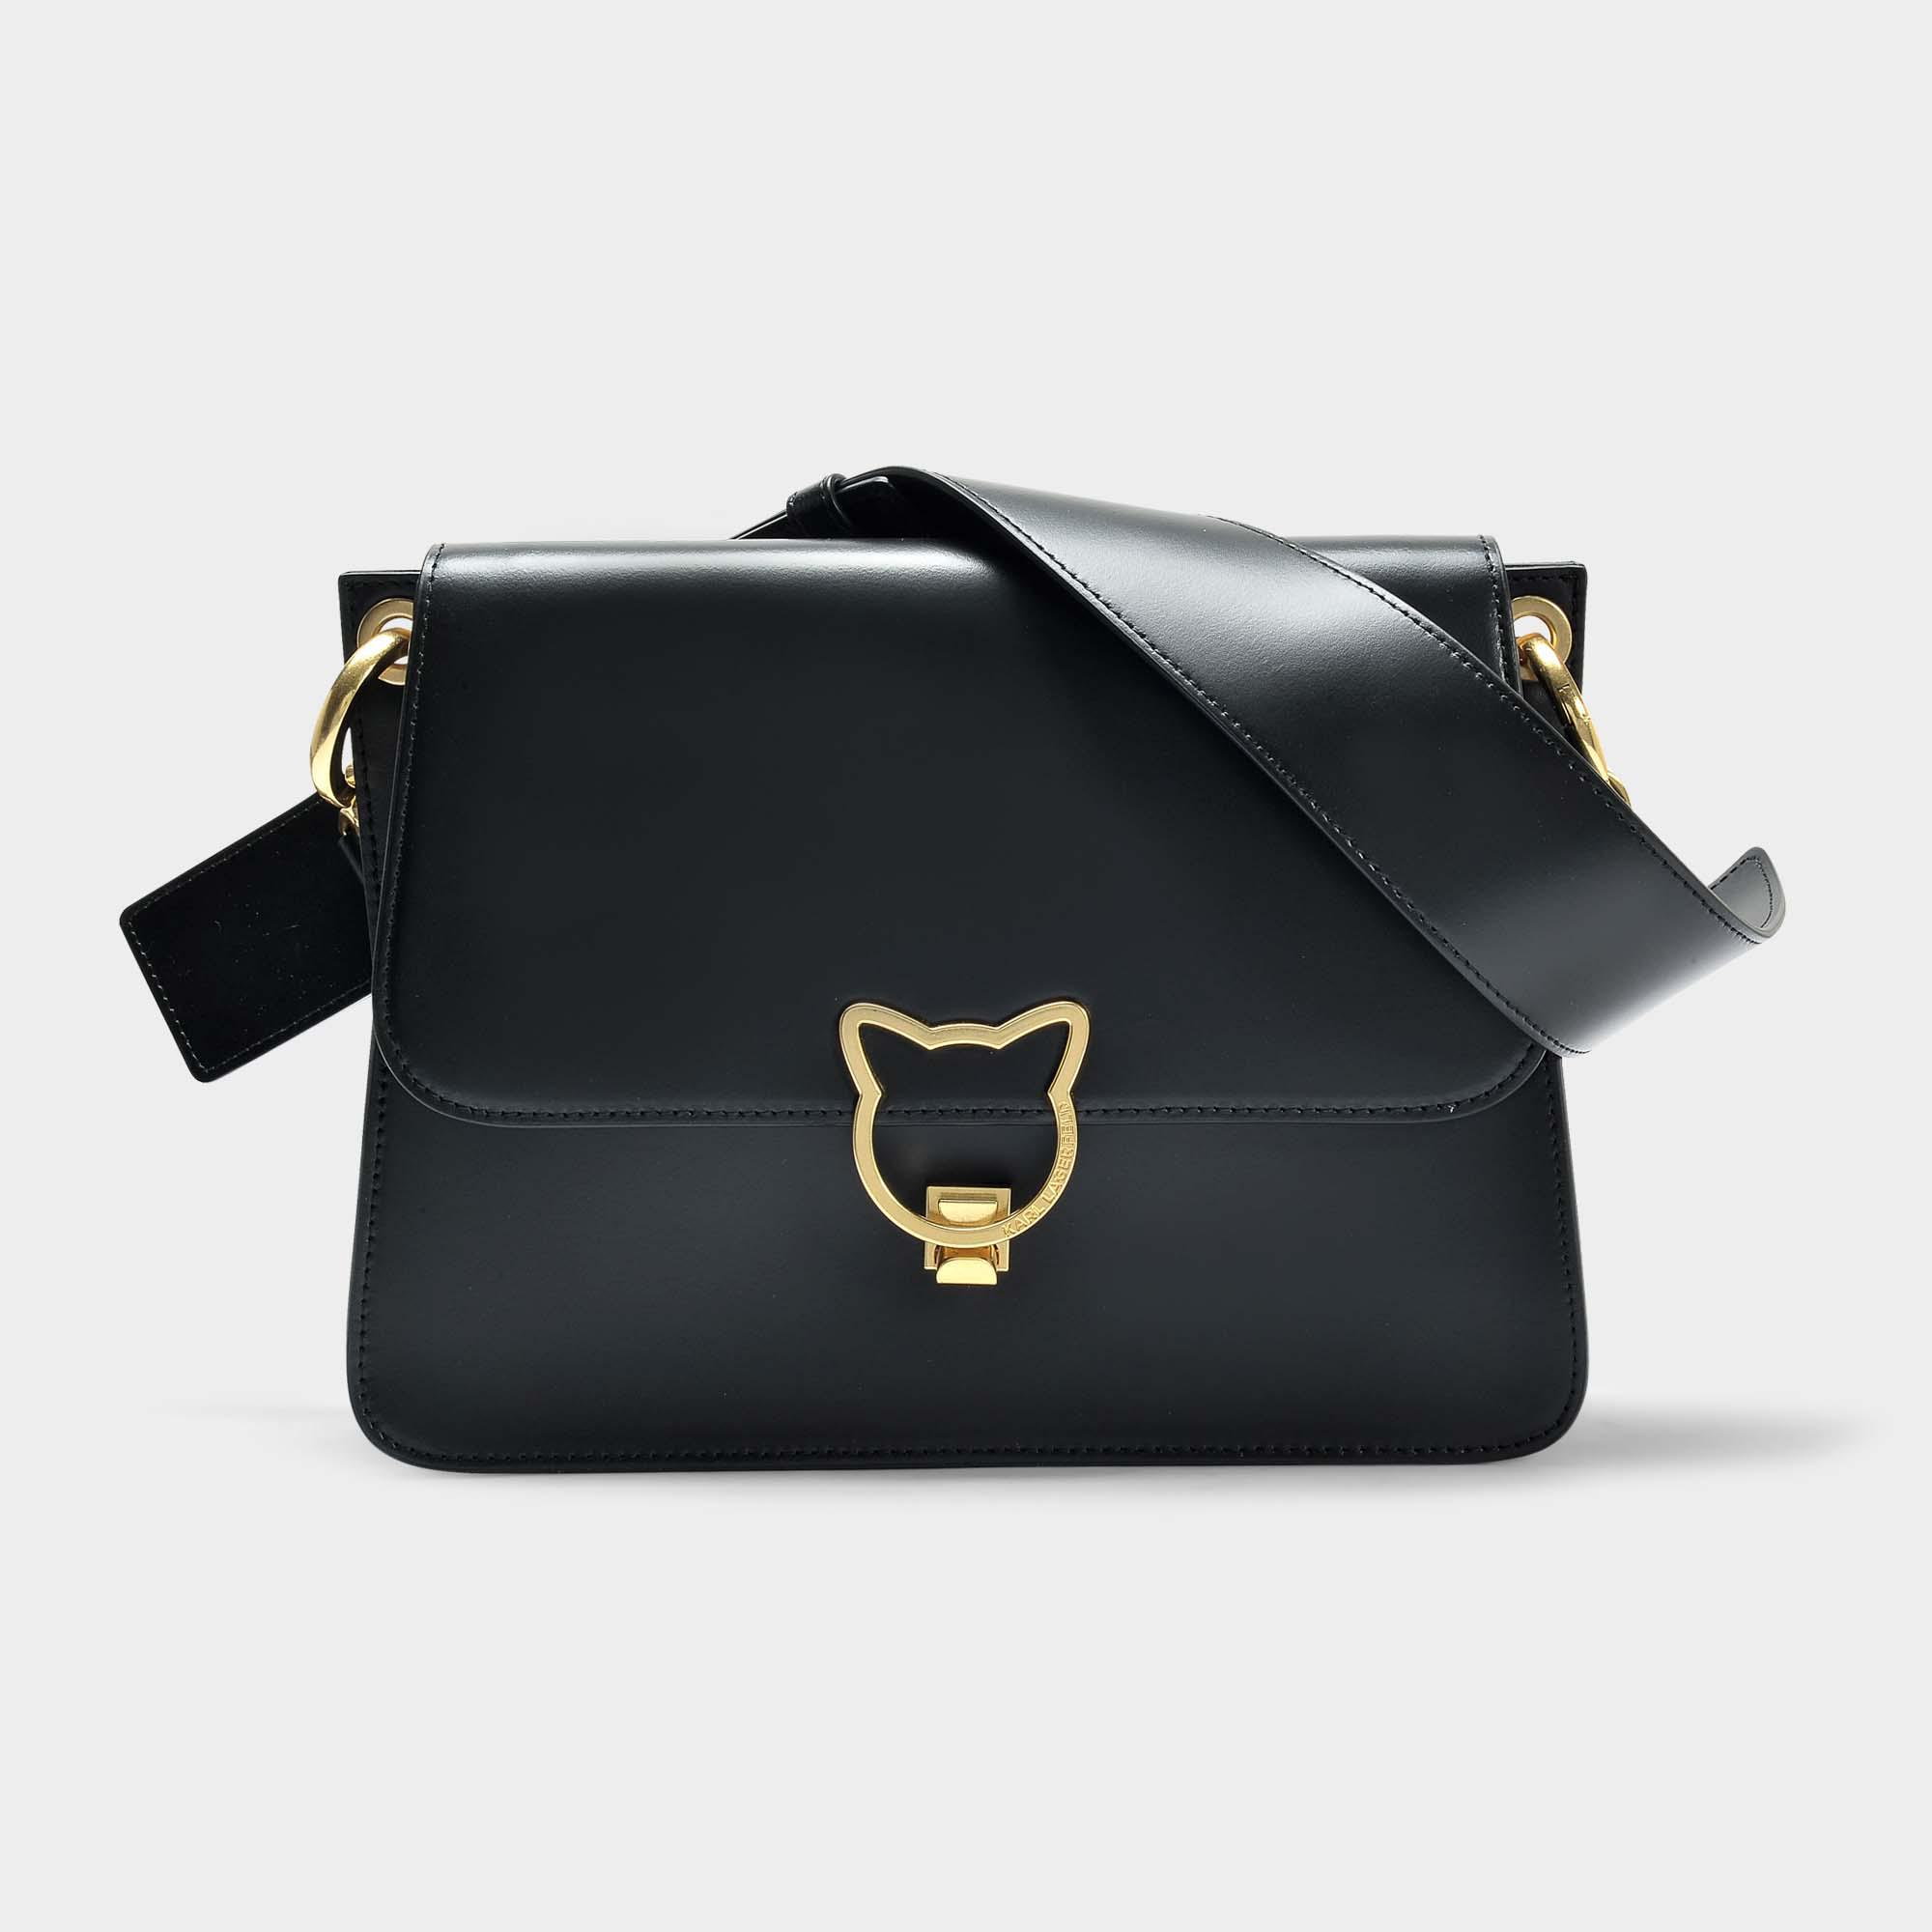 Kat Lock Crossbody Bag in Black Smooth Calf Leather Karl Lagerfeld Online Store yZiWzso